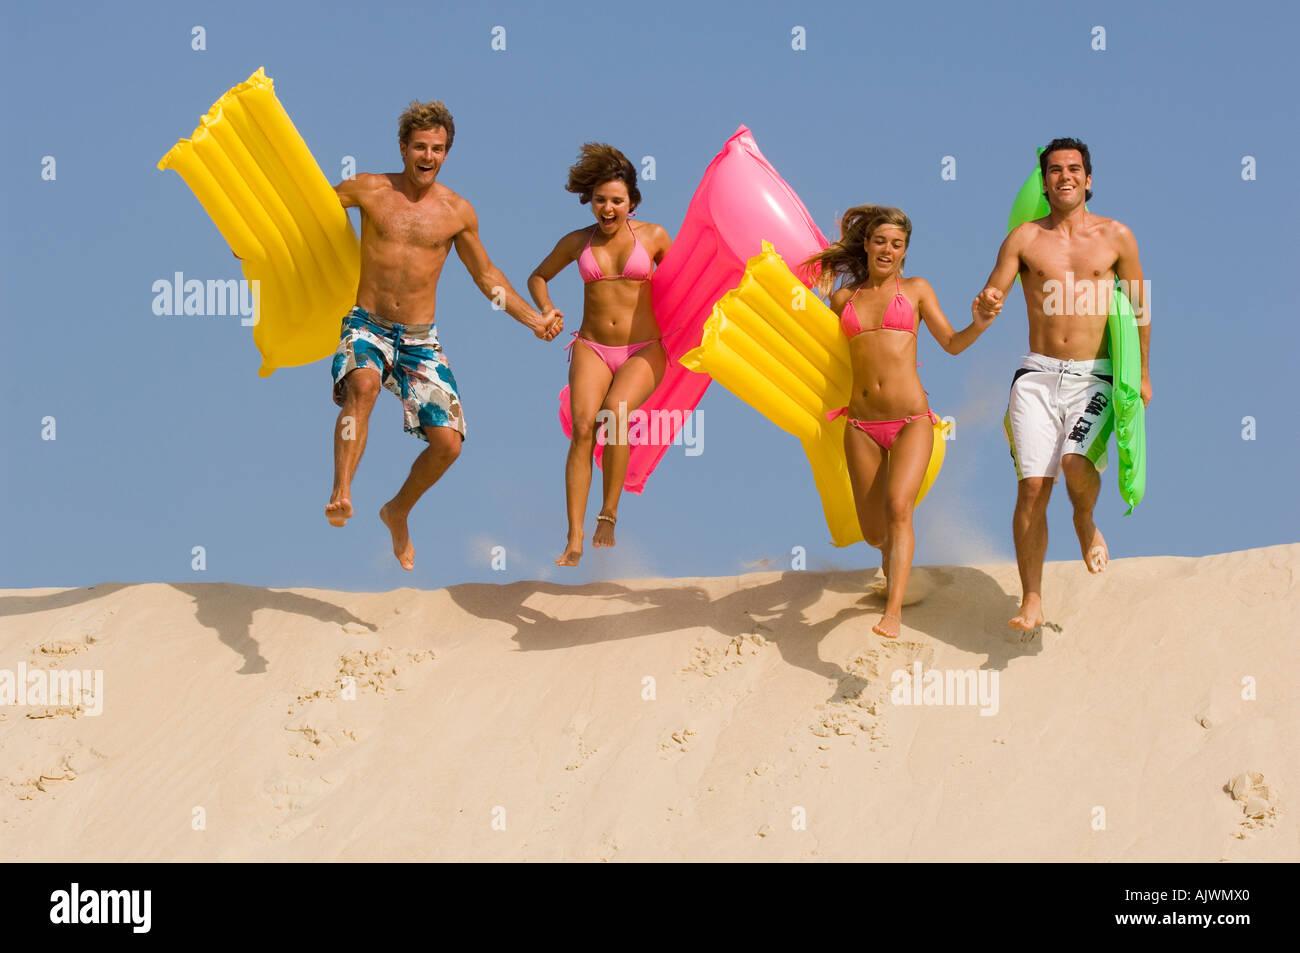 people having fun at the beach - Stock Image